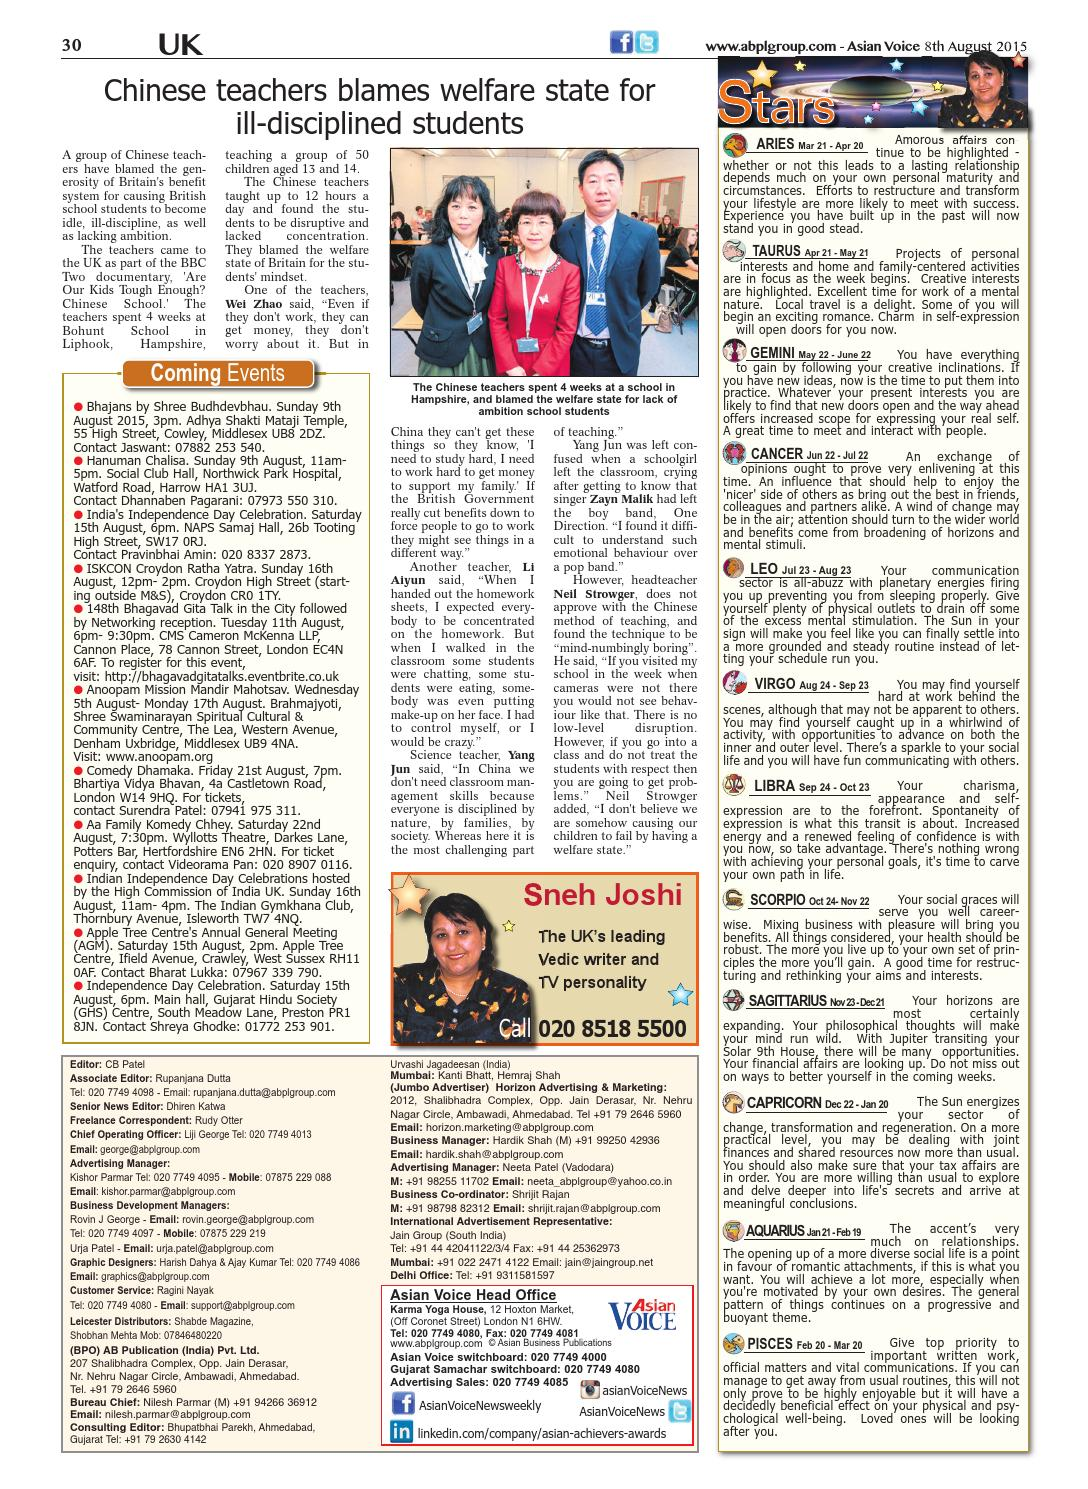 AV 8th August 2015 by Asian Business Publications Ltd - issuu